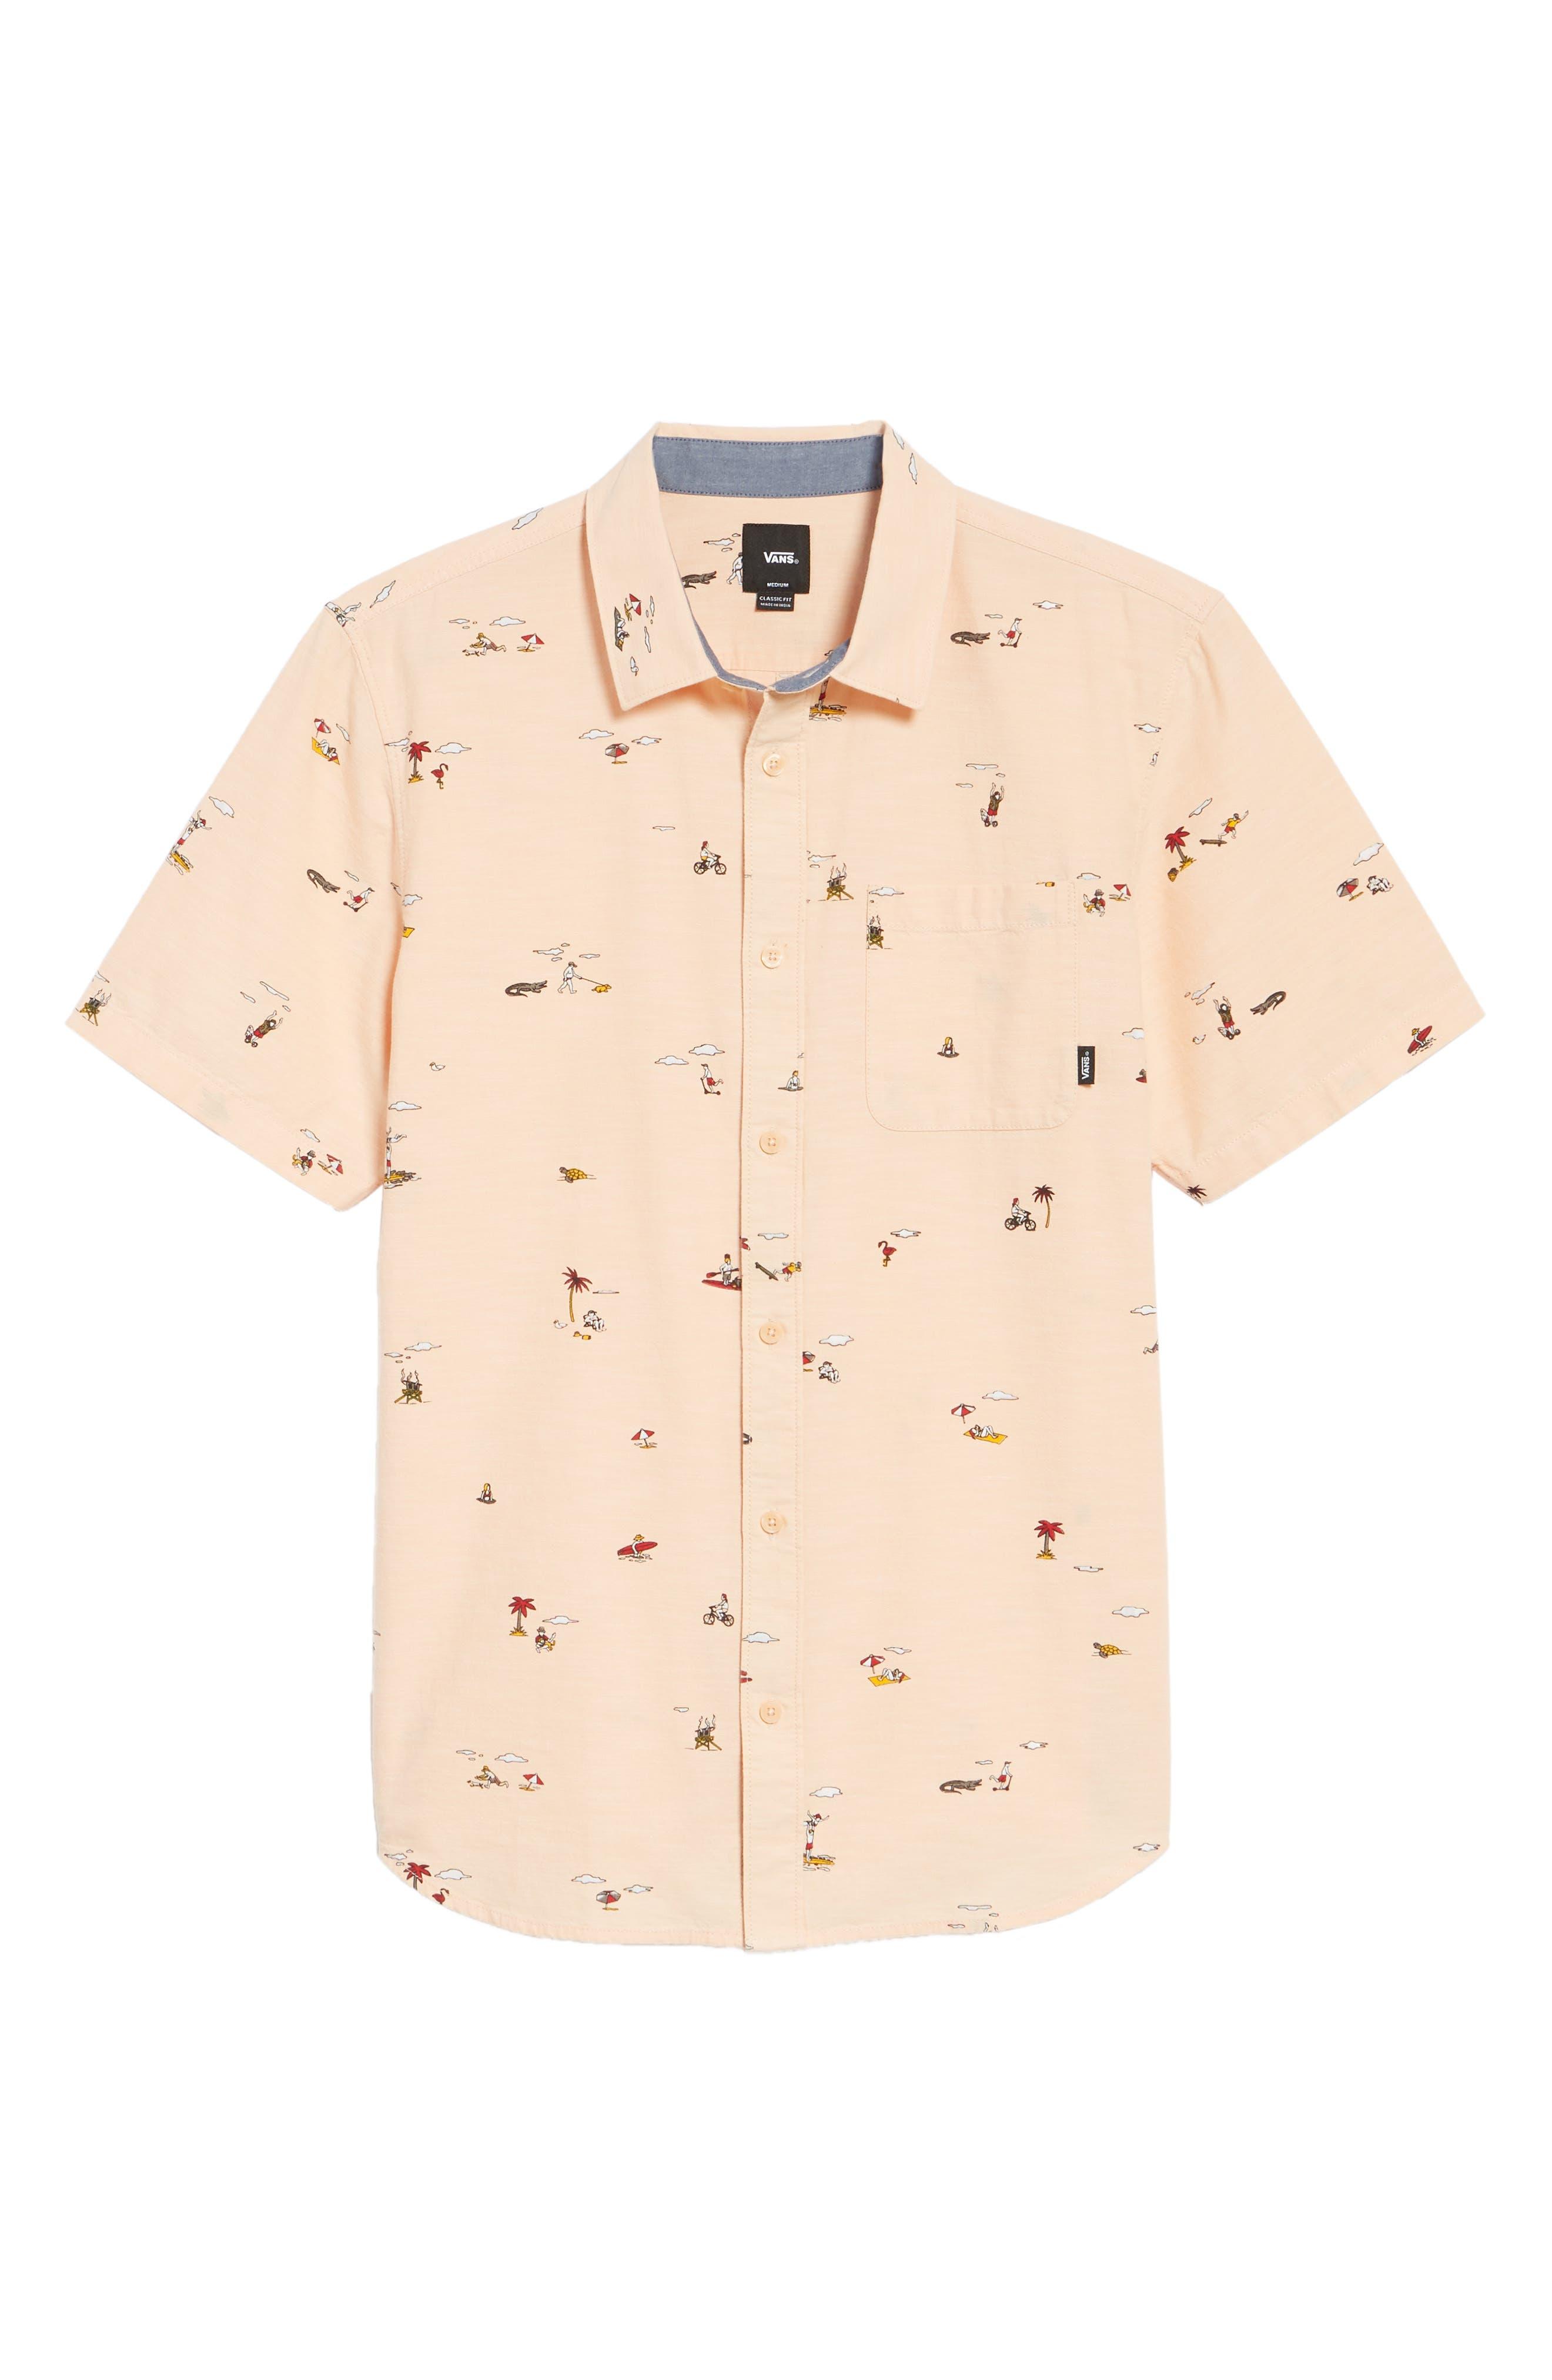 Tres Palmas Short Sleeve Shirt,                             Alternate thumbnail 6, color,                             Apricot Ice